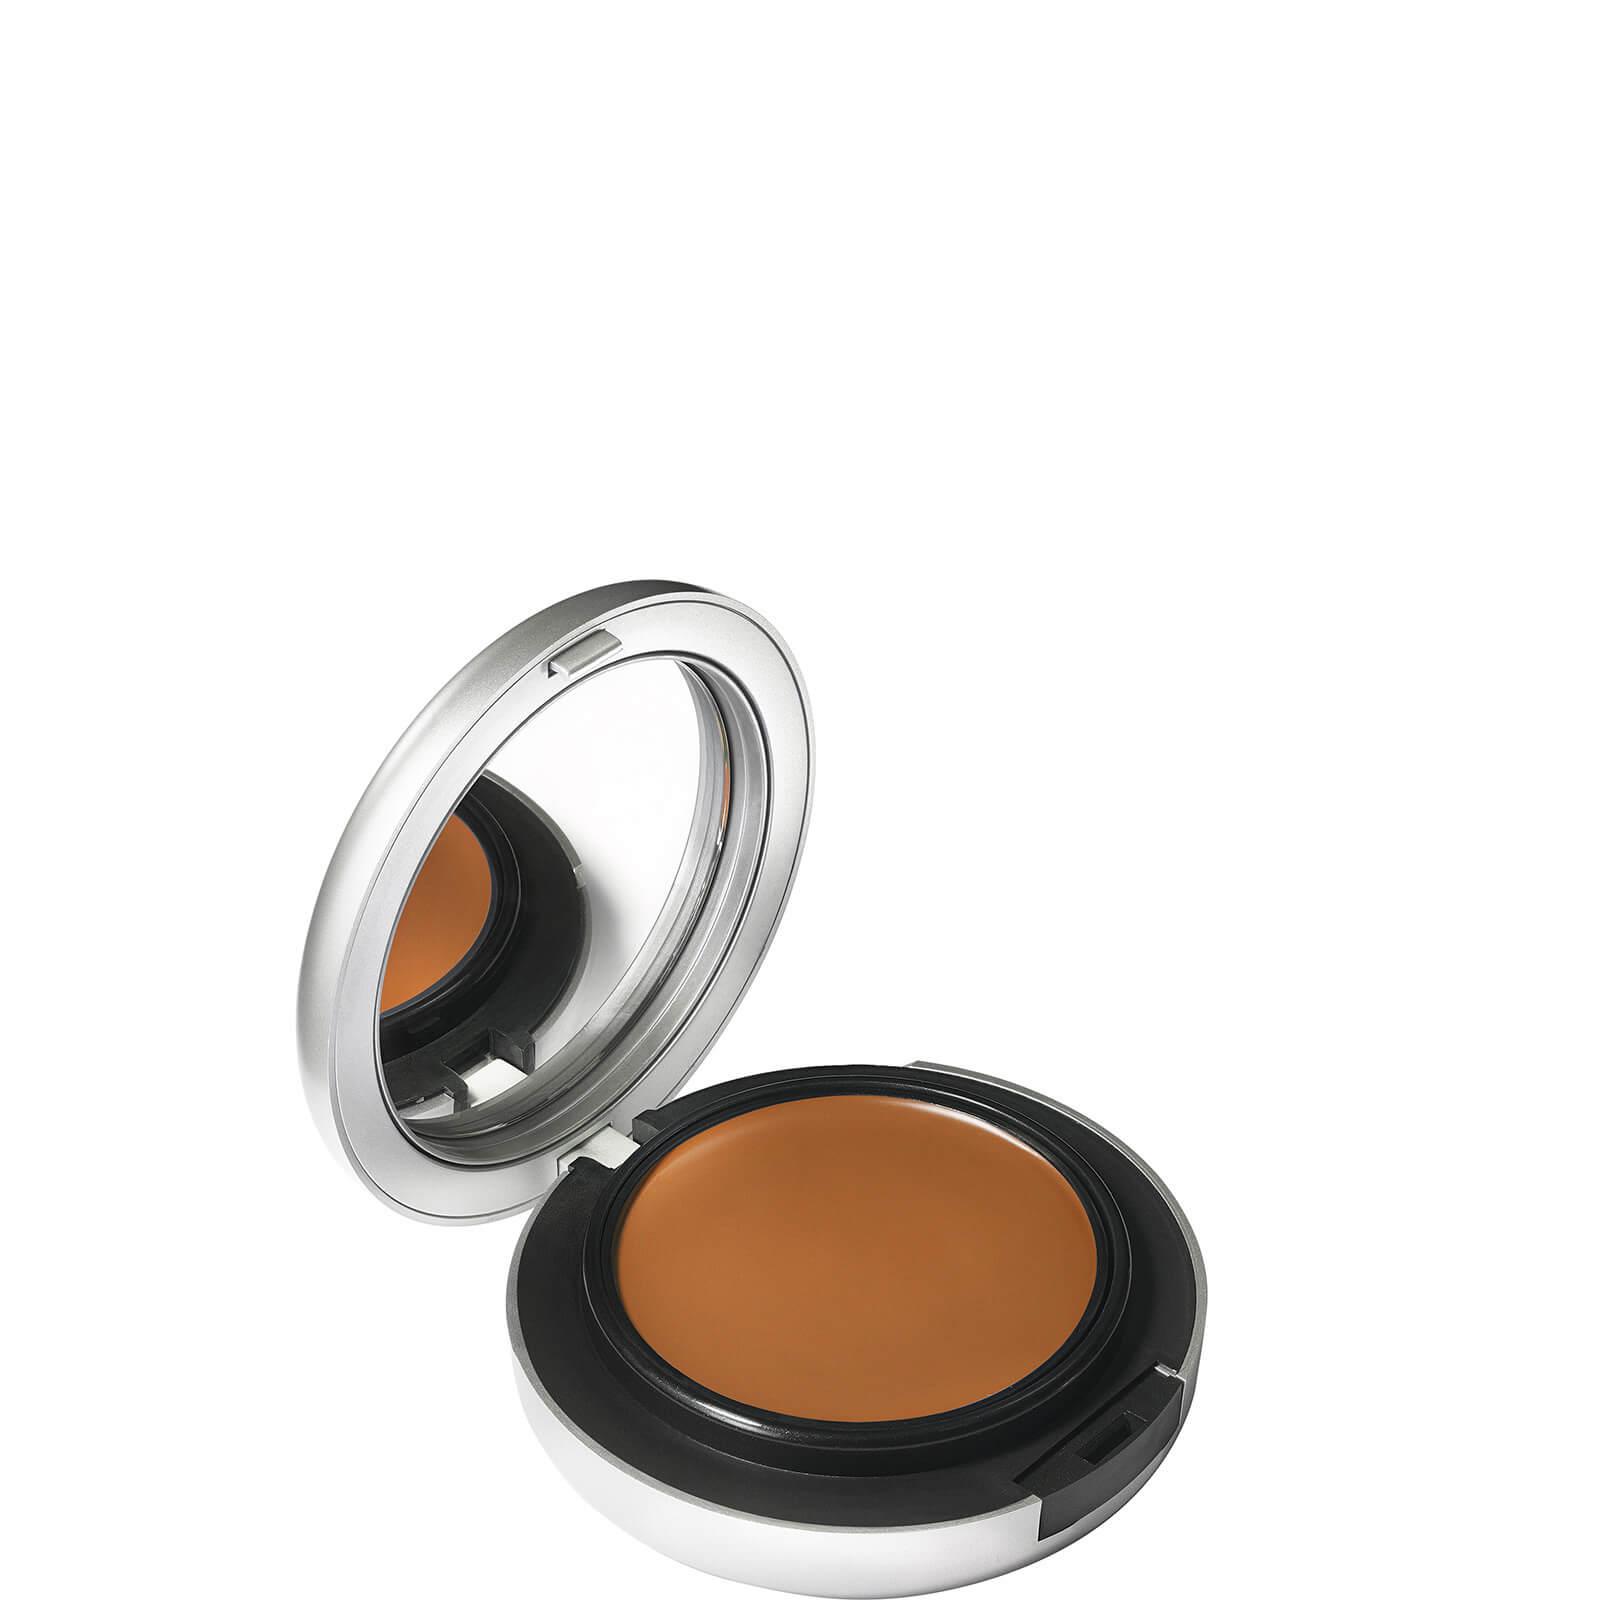 MAC Studio Fix Tech Cream-to-Powder Foundation 10g (Various Shades) - NC47